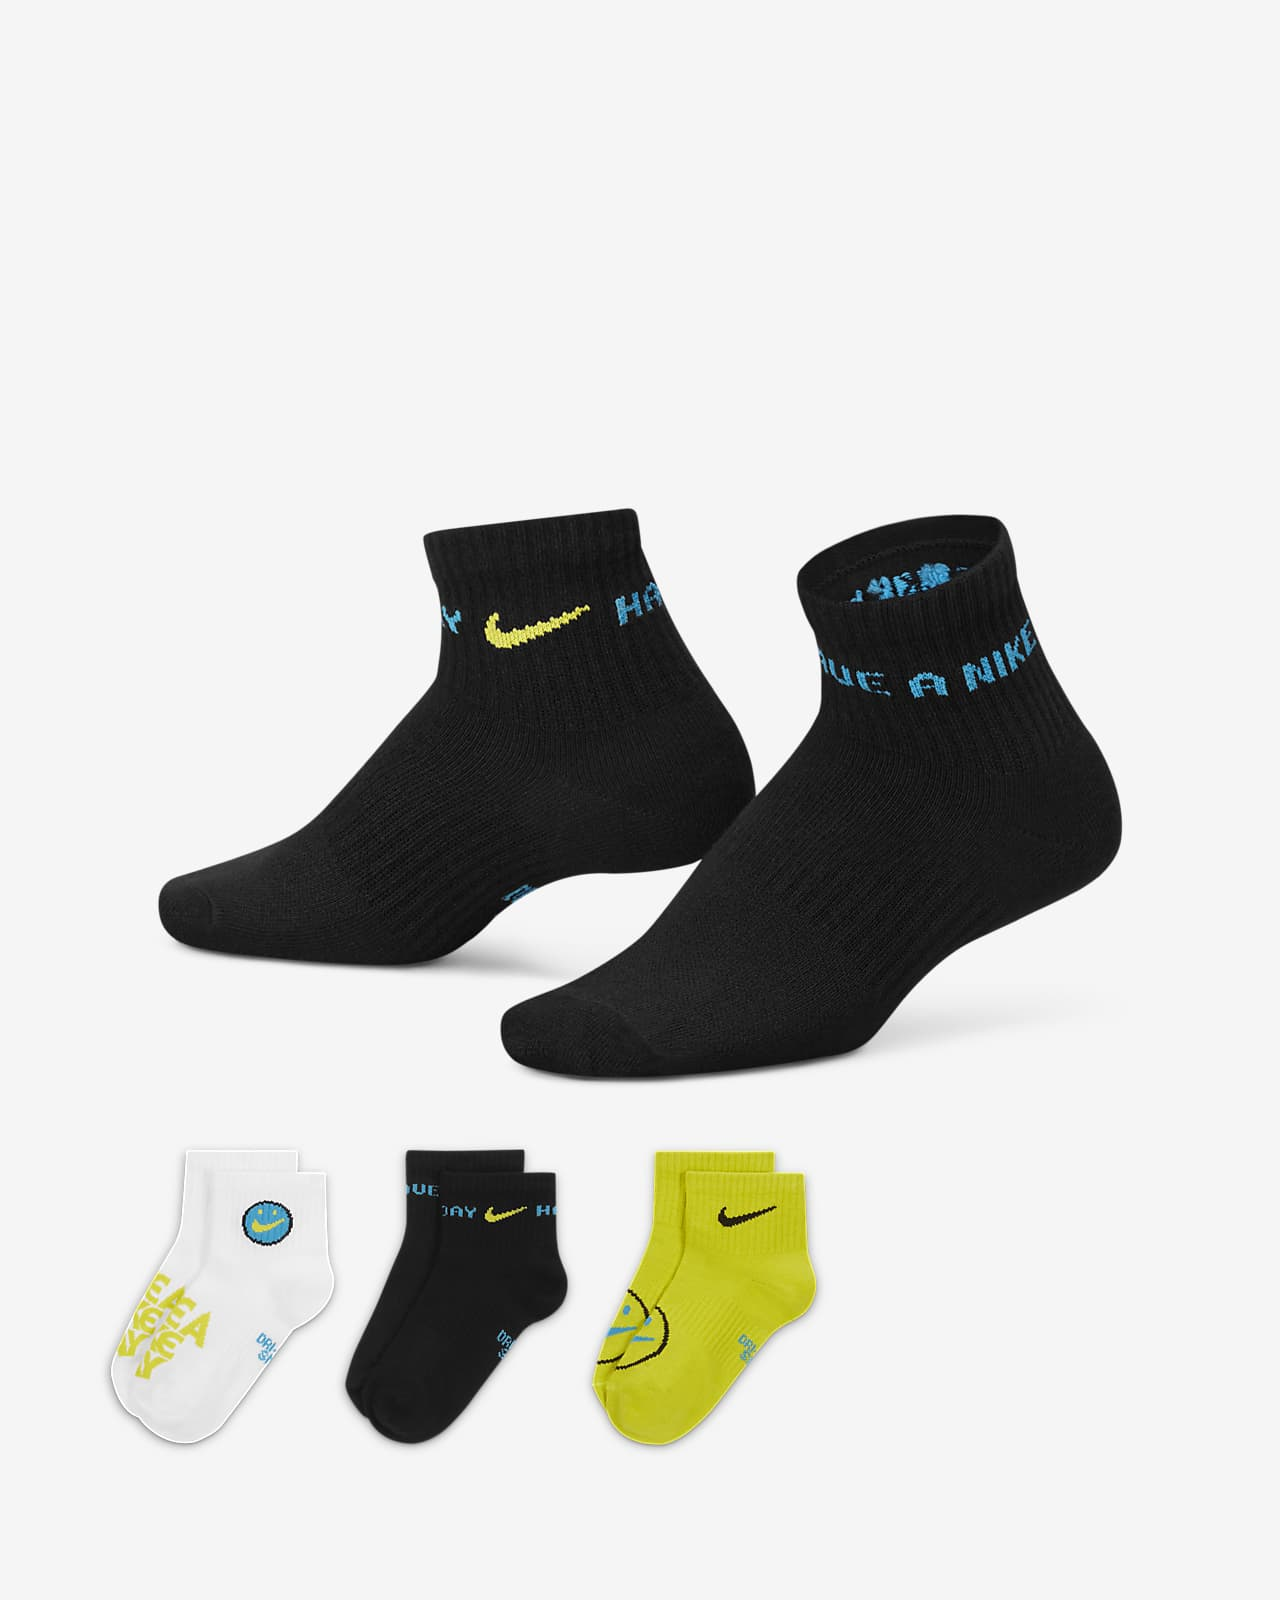 Nike Everyday Lichte enkelsokken voor kids (3 paar)